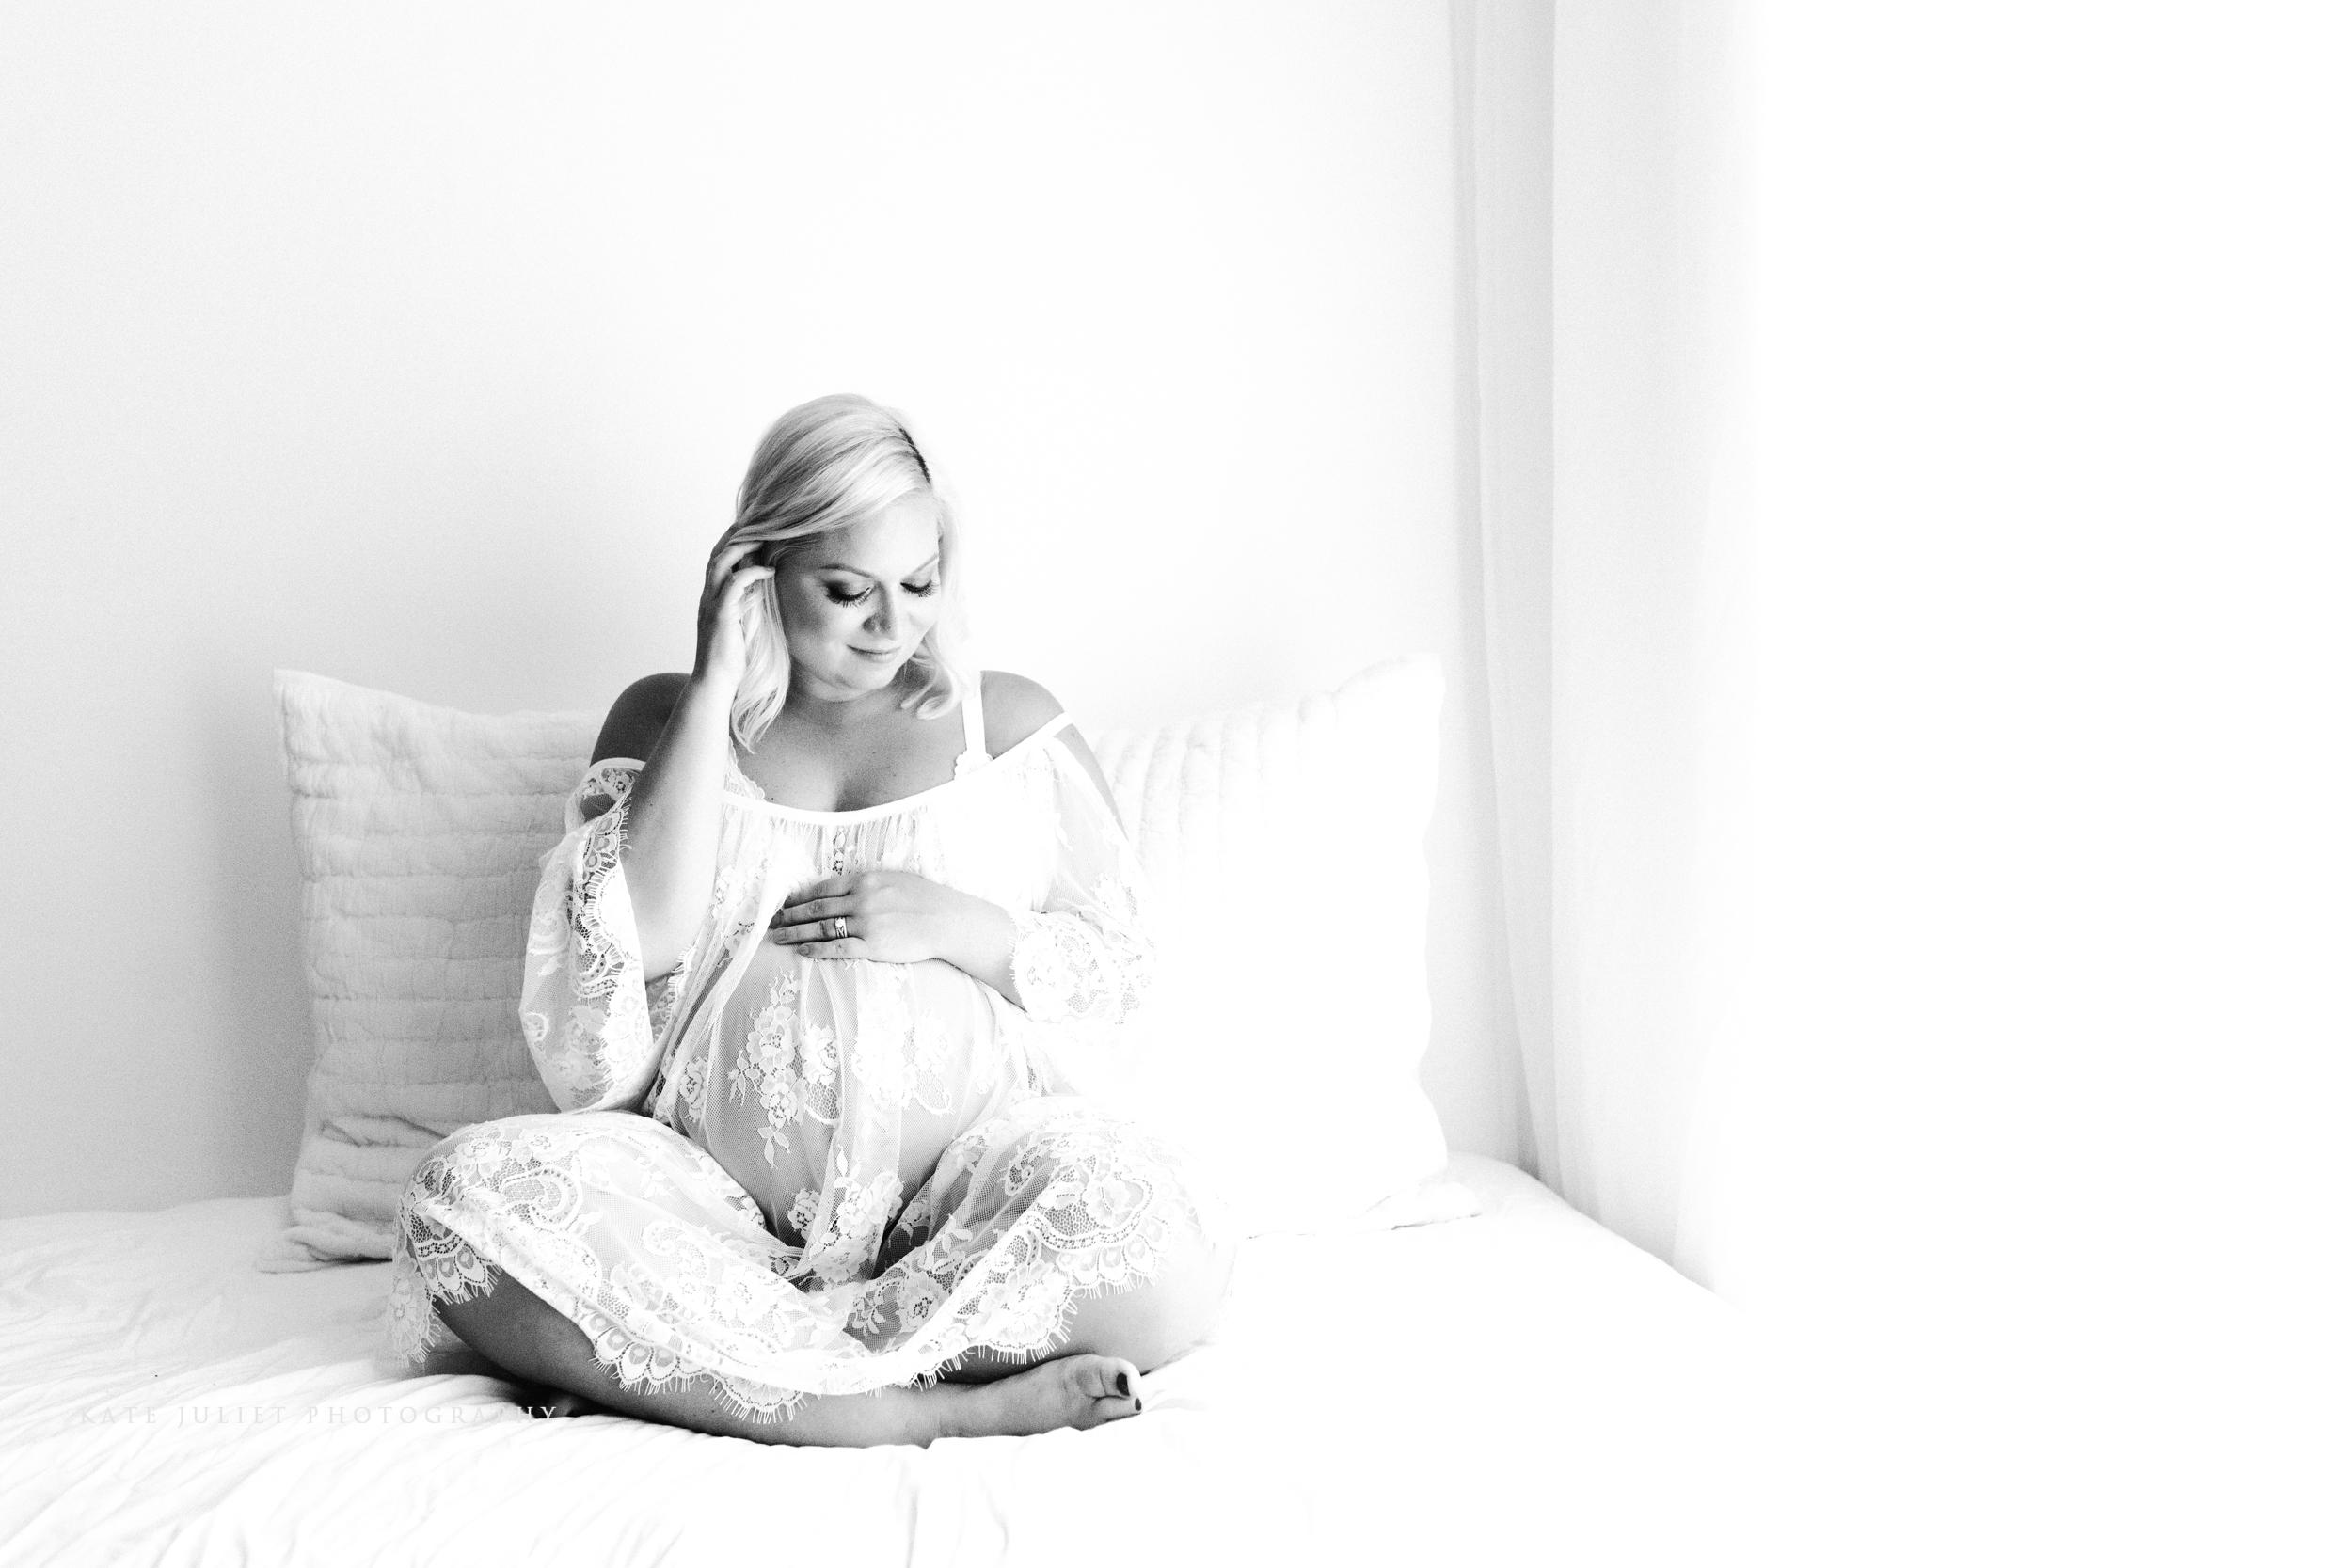 kate juliet photography - maternity - web -46.jpg